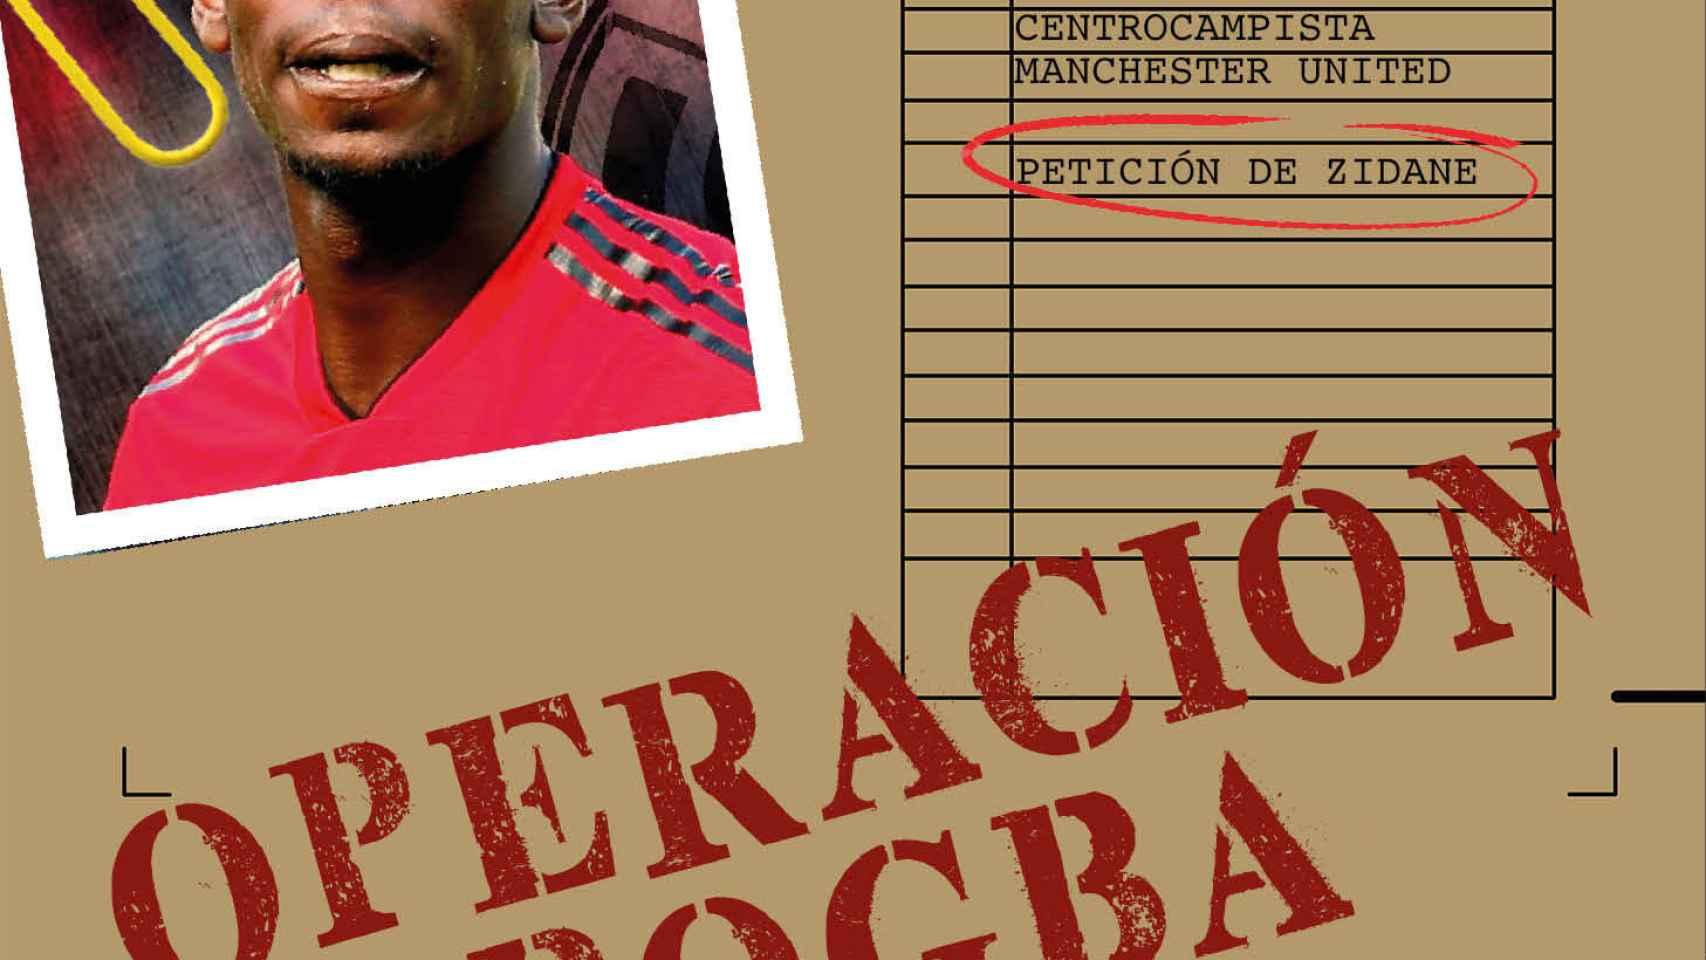 La portada de El Bernabéu (11/06/2019)